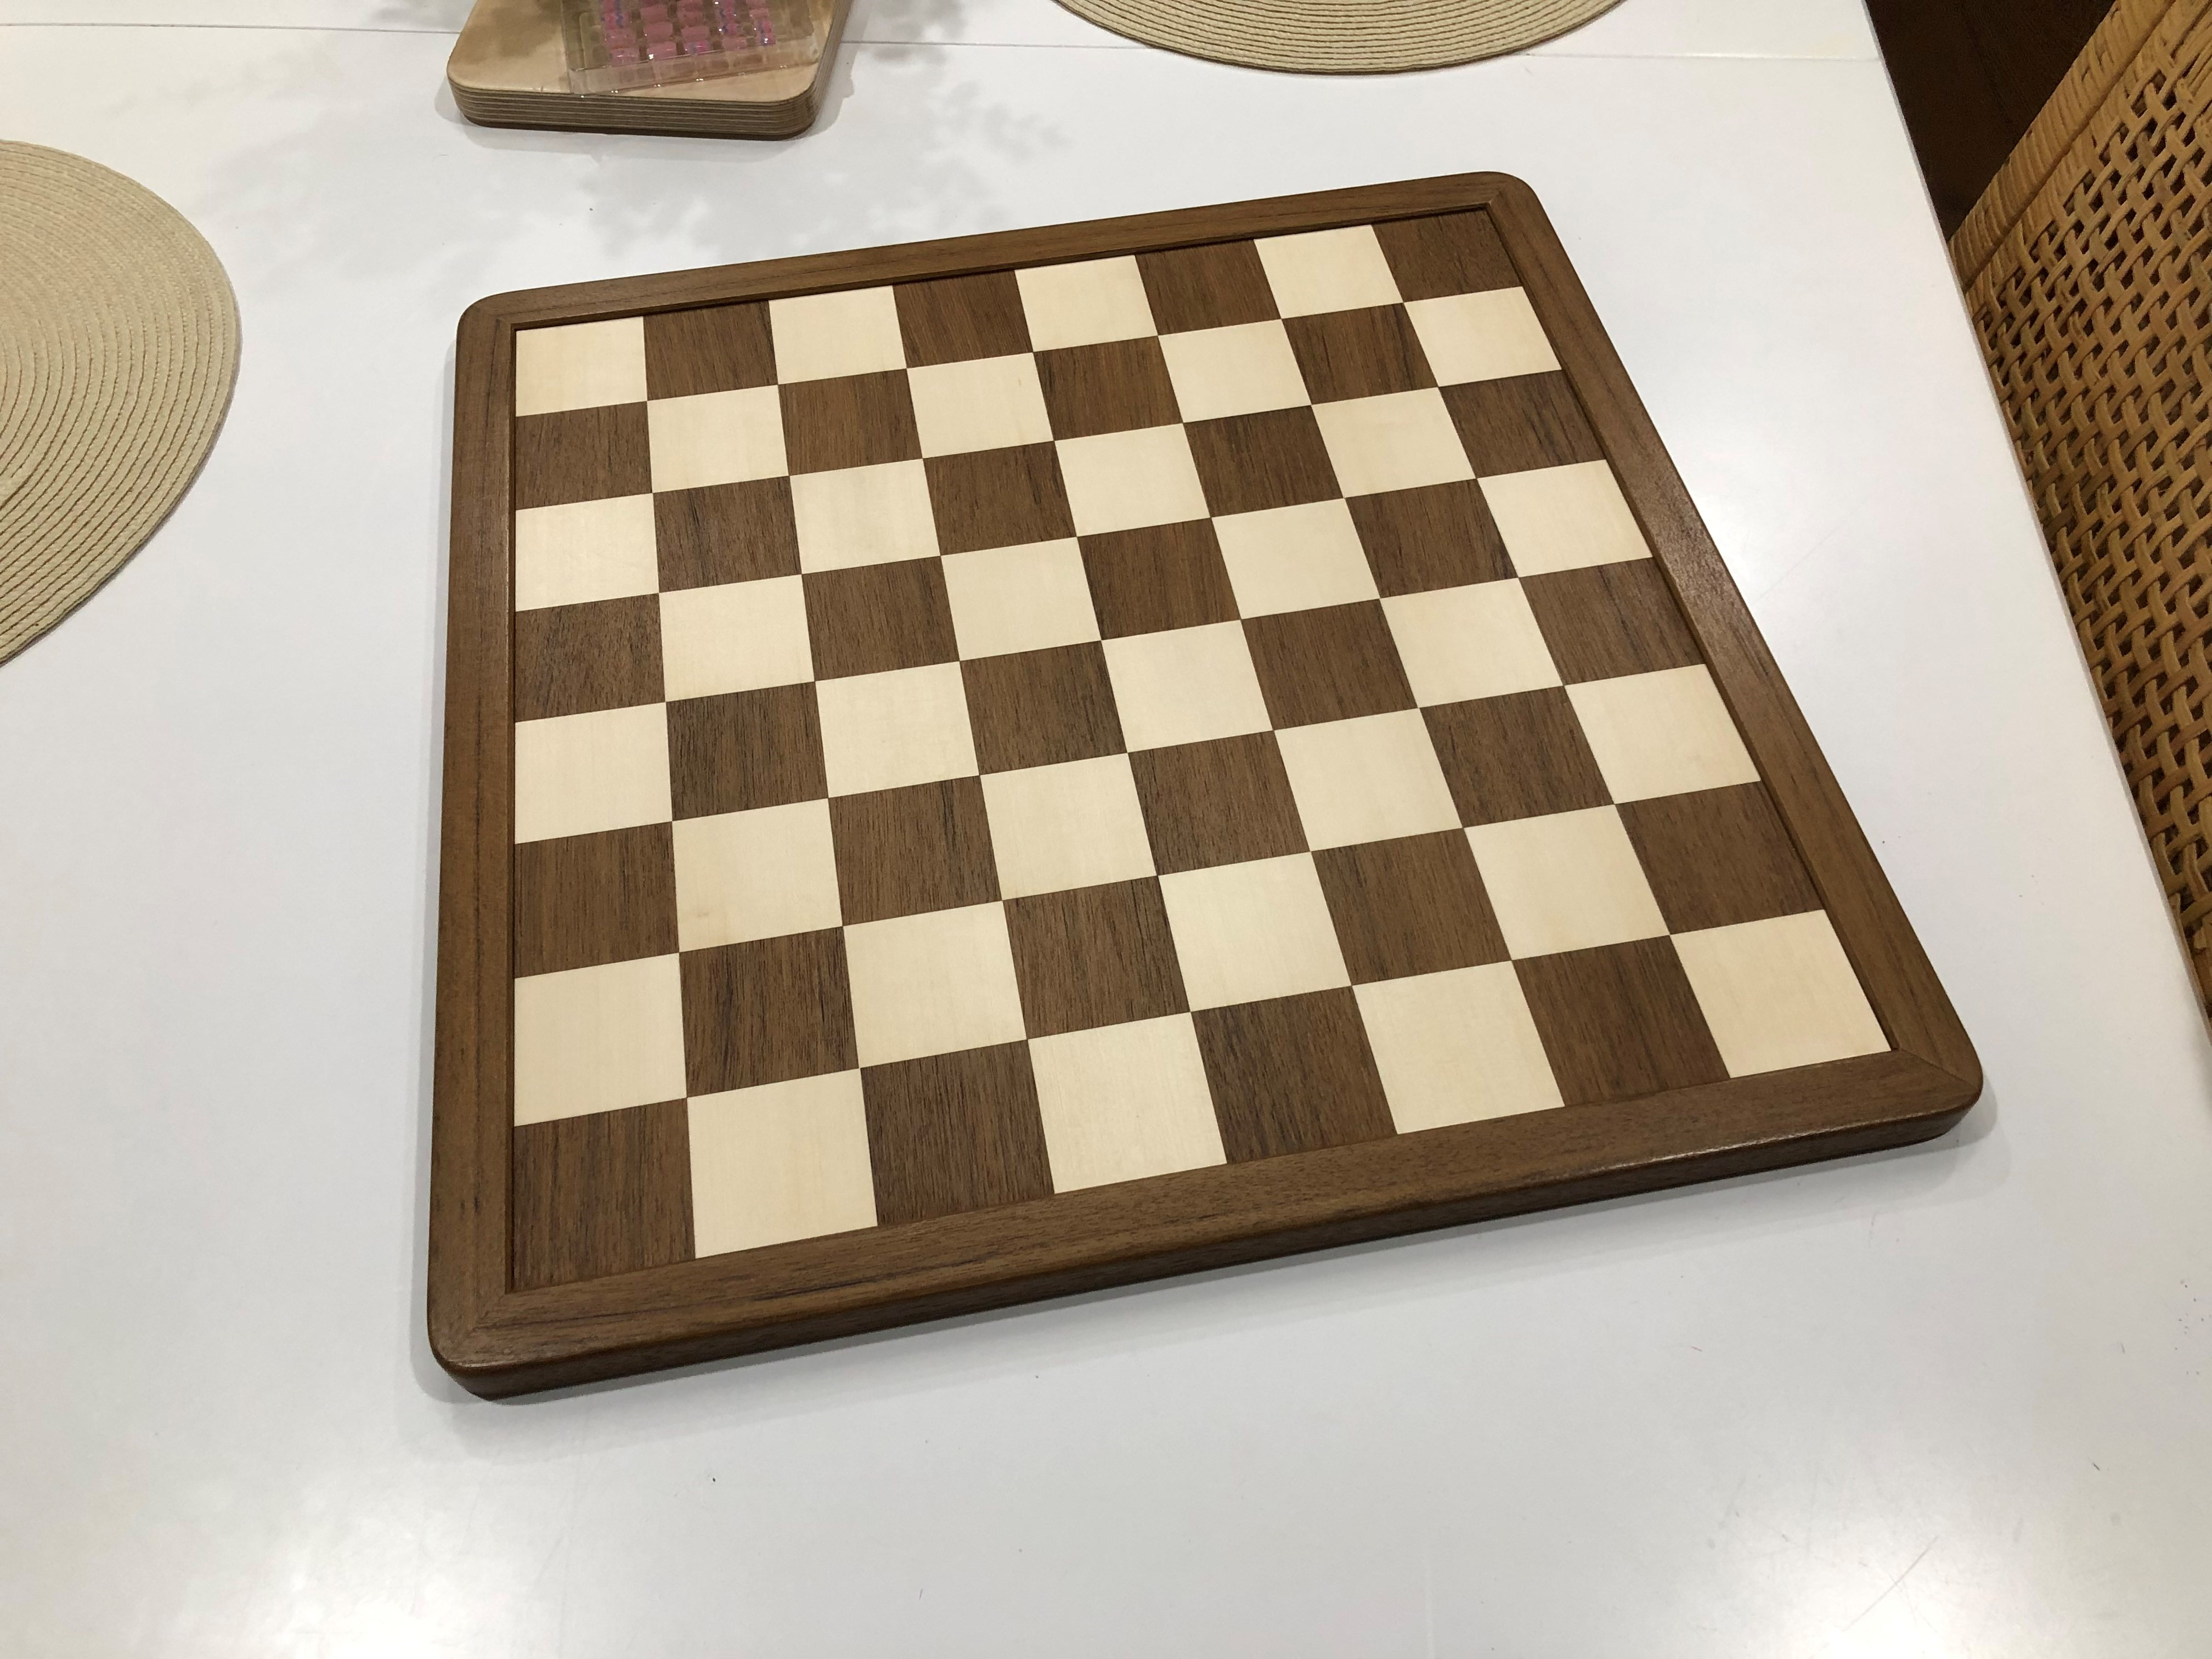 chess board 2.jpg